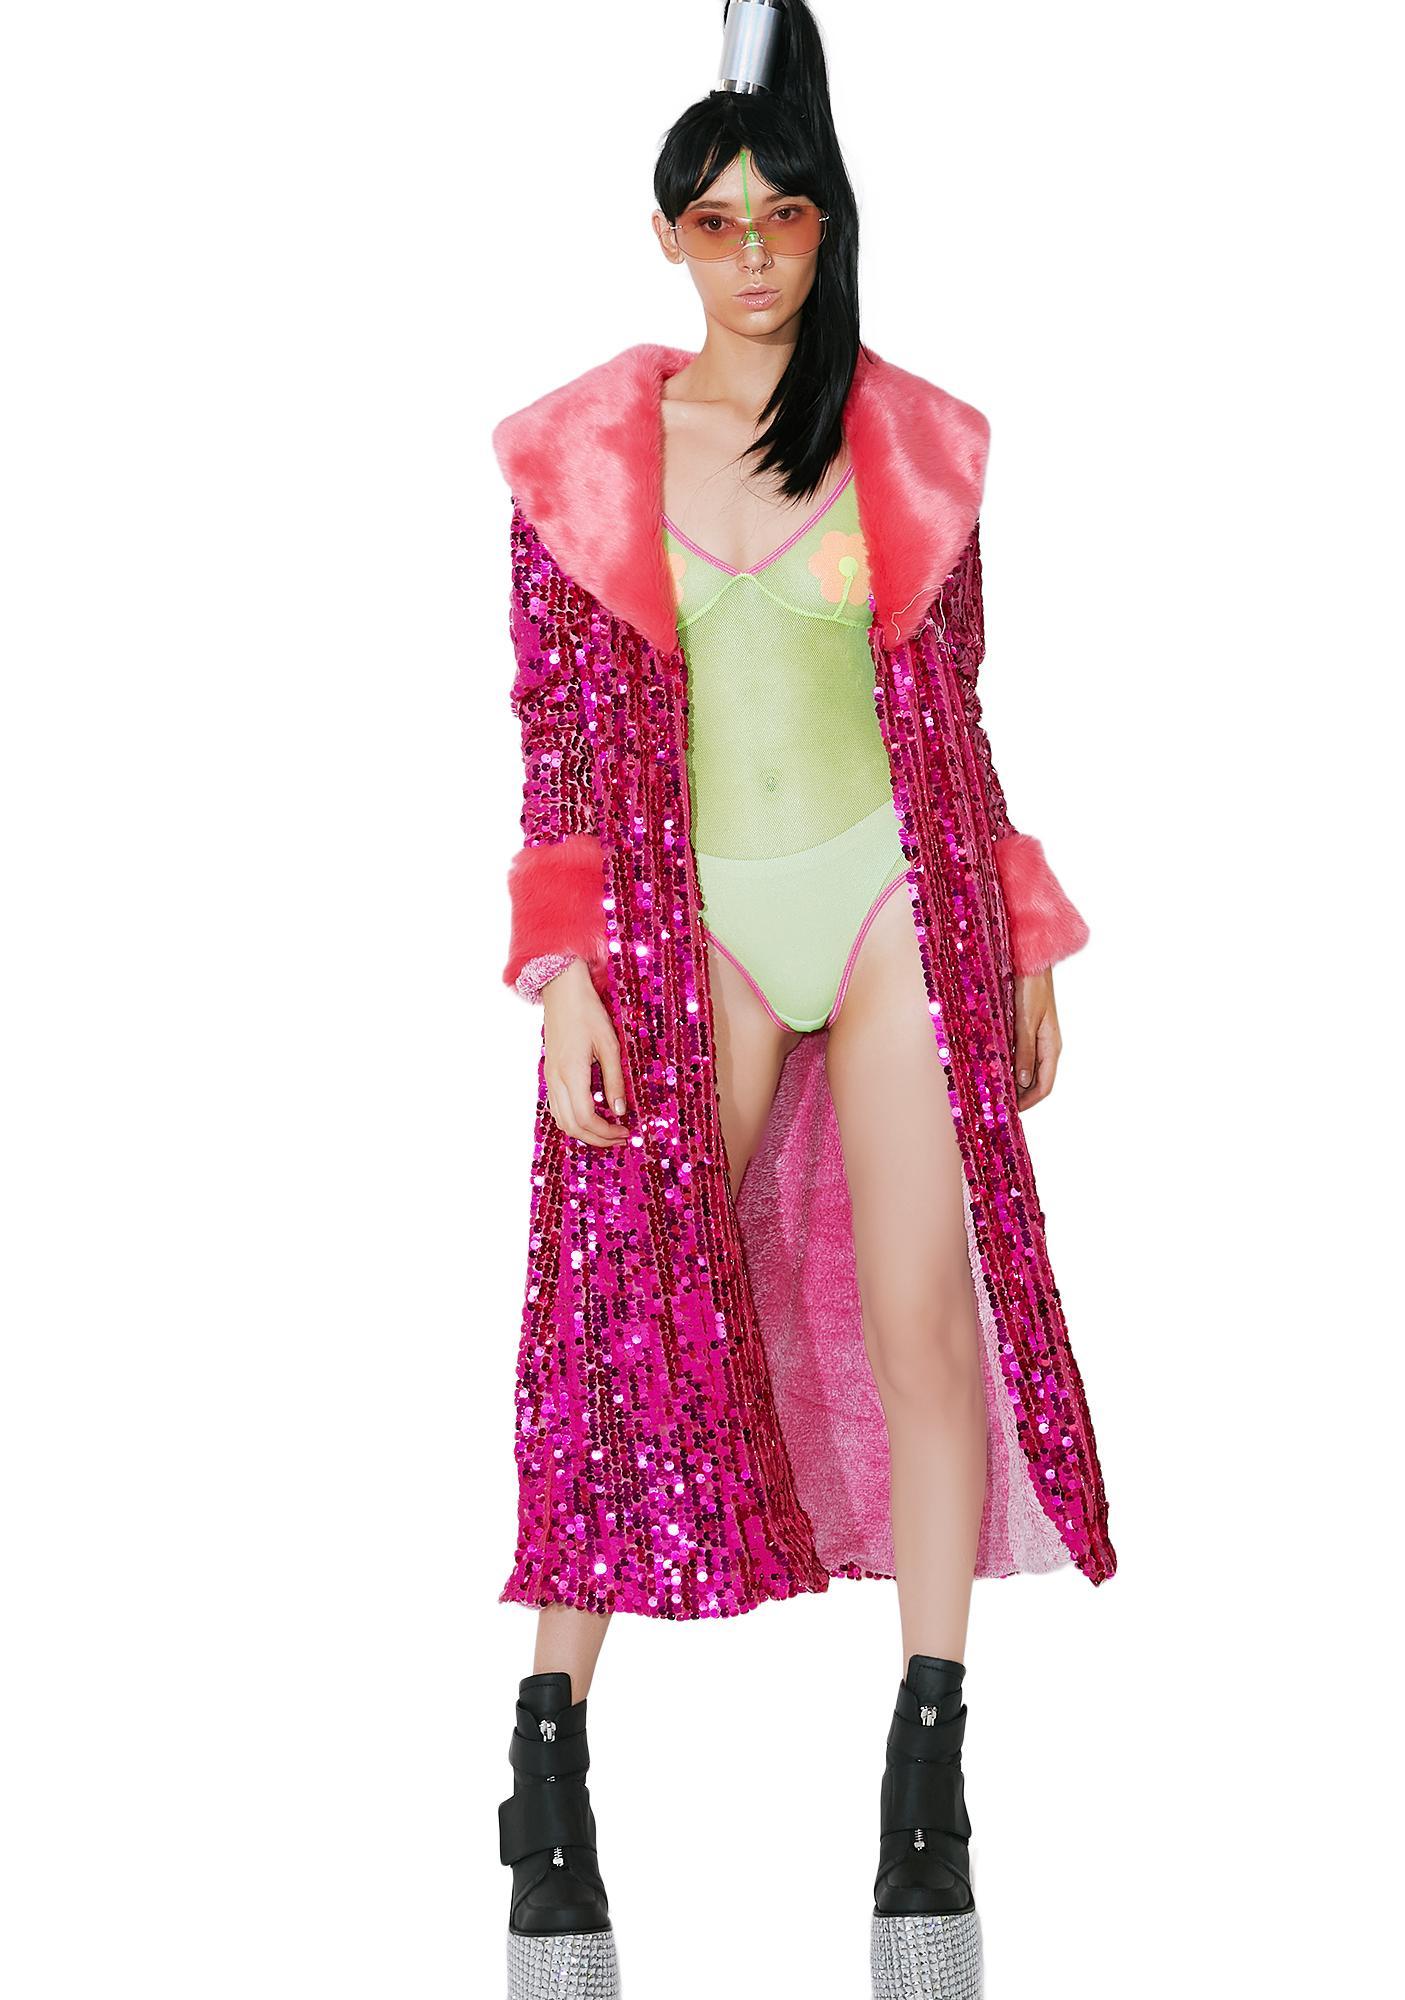 EASY TIGER Feeling Pink Festi Coat